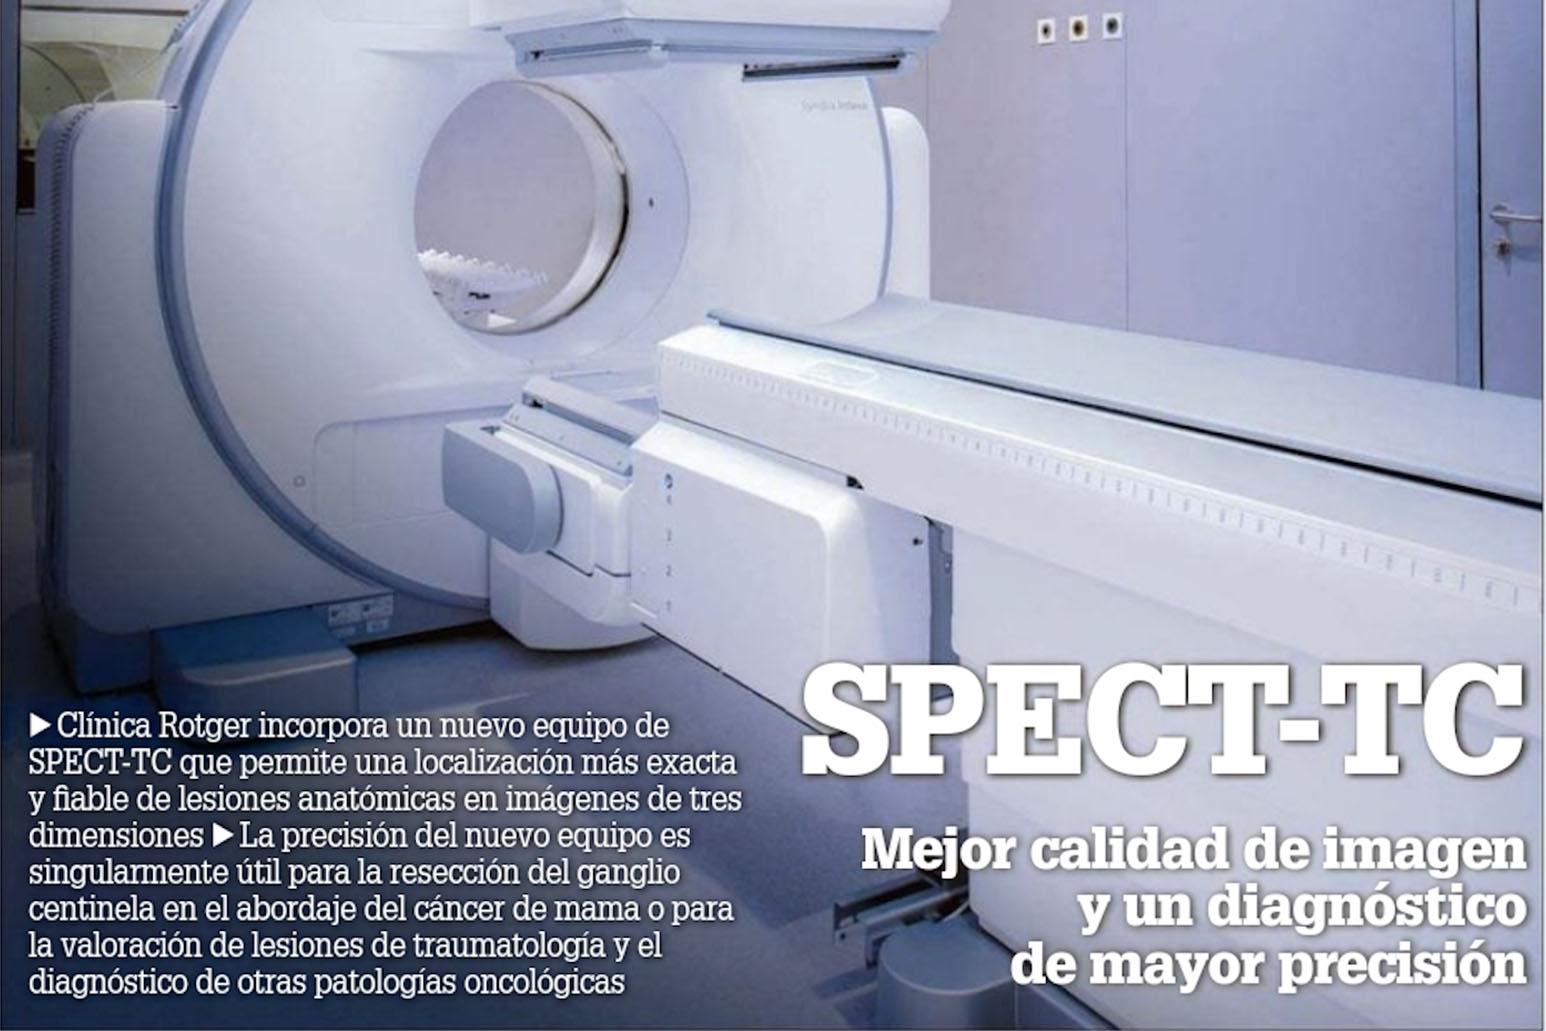 SPECT-TC-Clinica-Rotger-Hospital-Mallorca